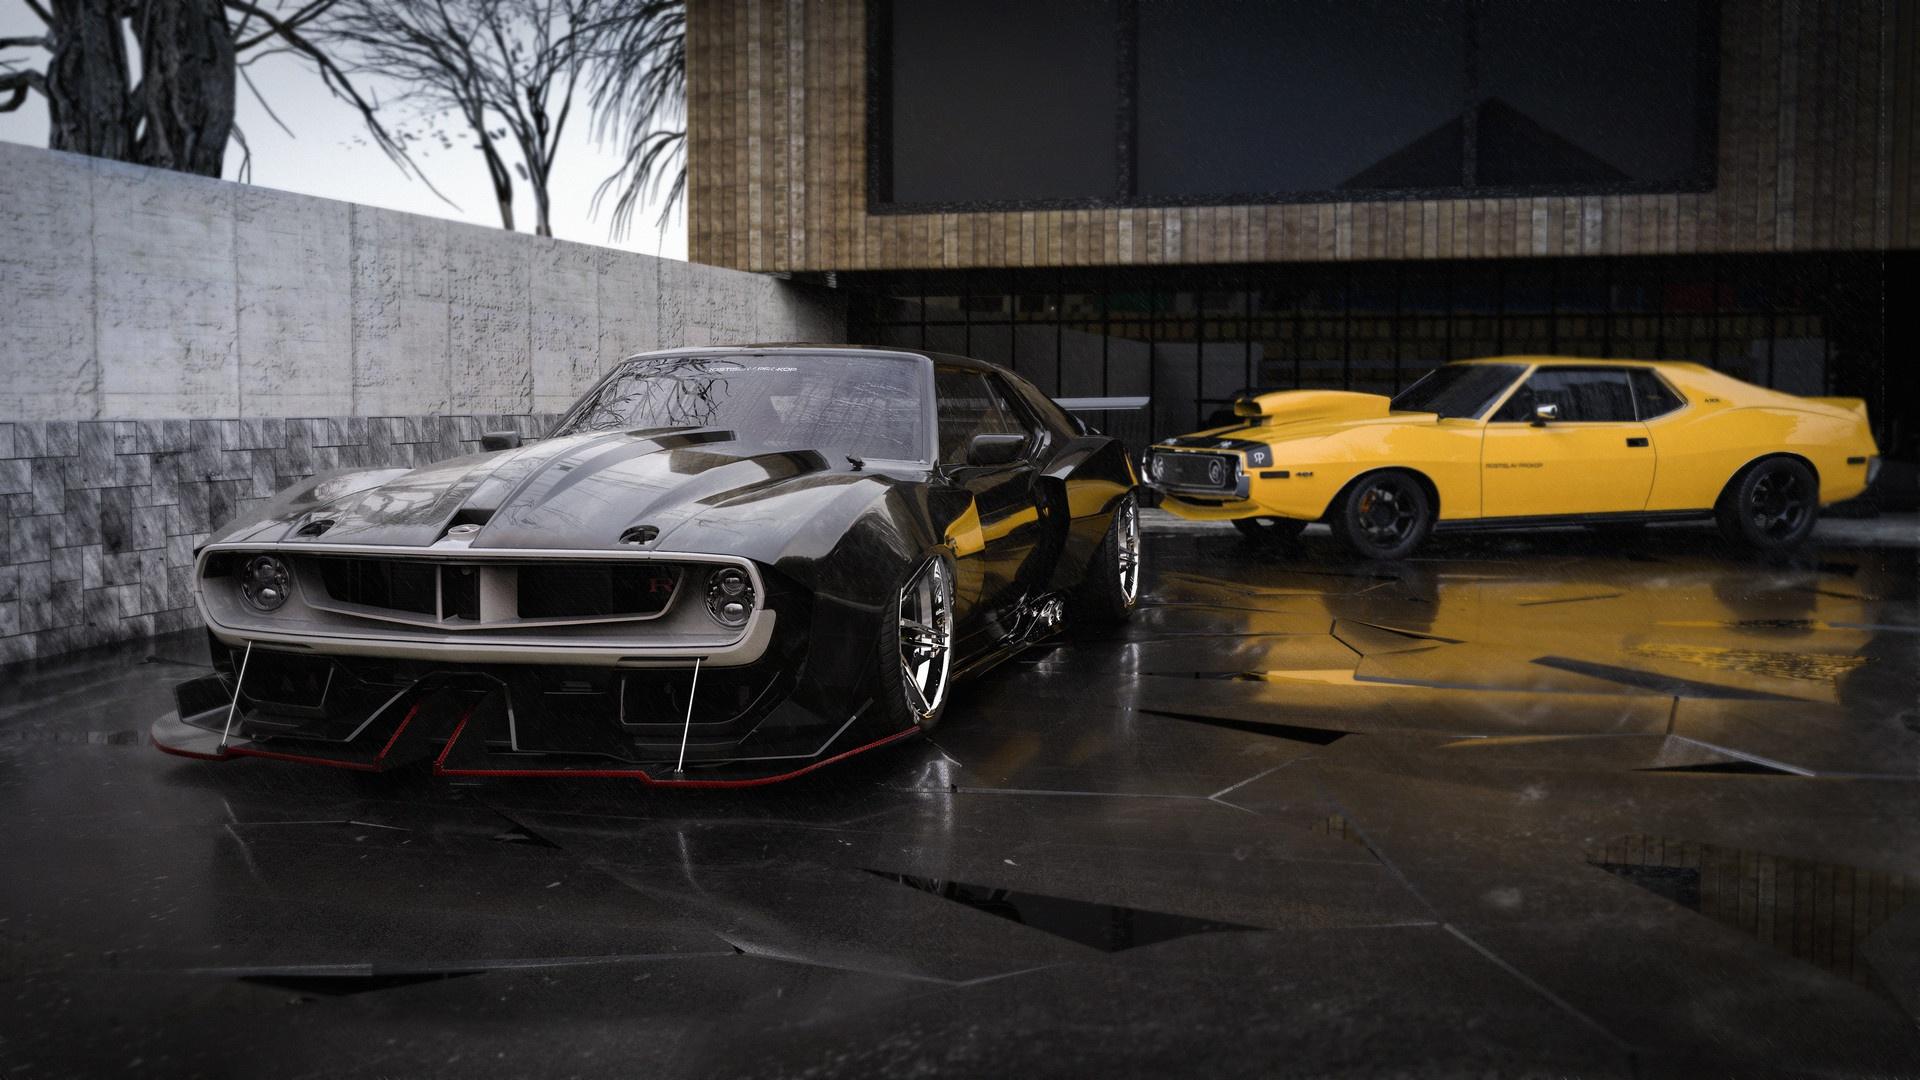 Wallpaper Car Black Cars Yellow Cars Rostislav Prokop Vehicle